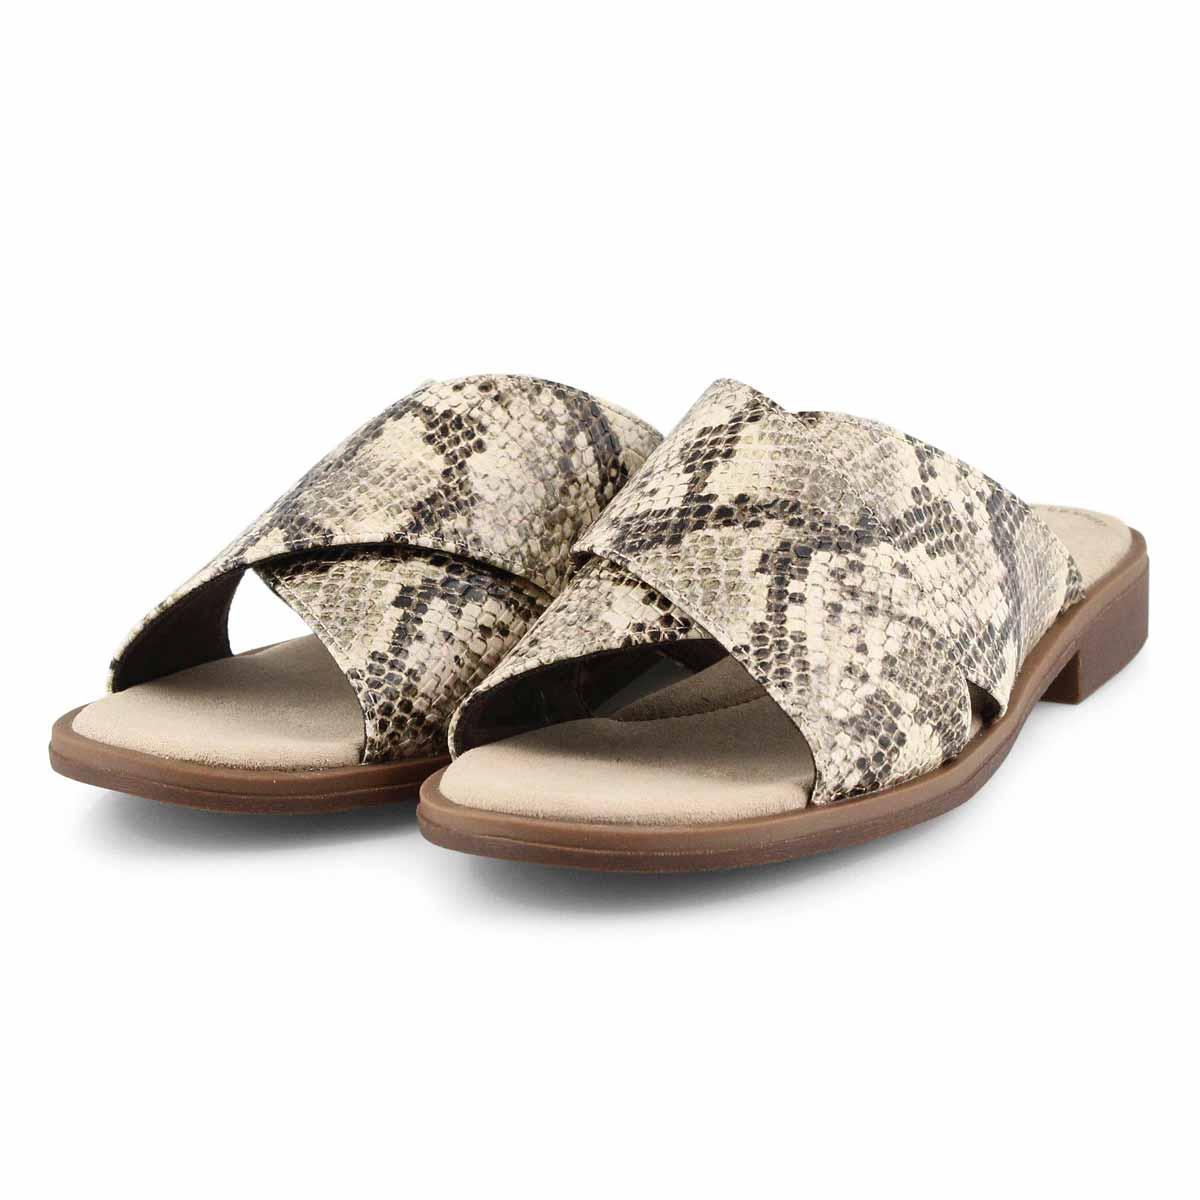 Women's Declan Ivy Slide Sandal - Taupe Snake